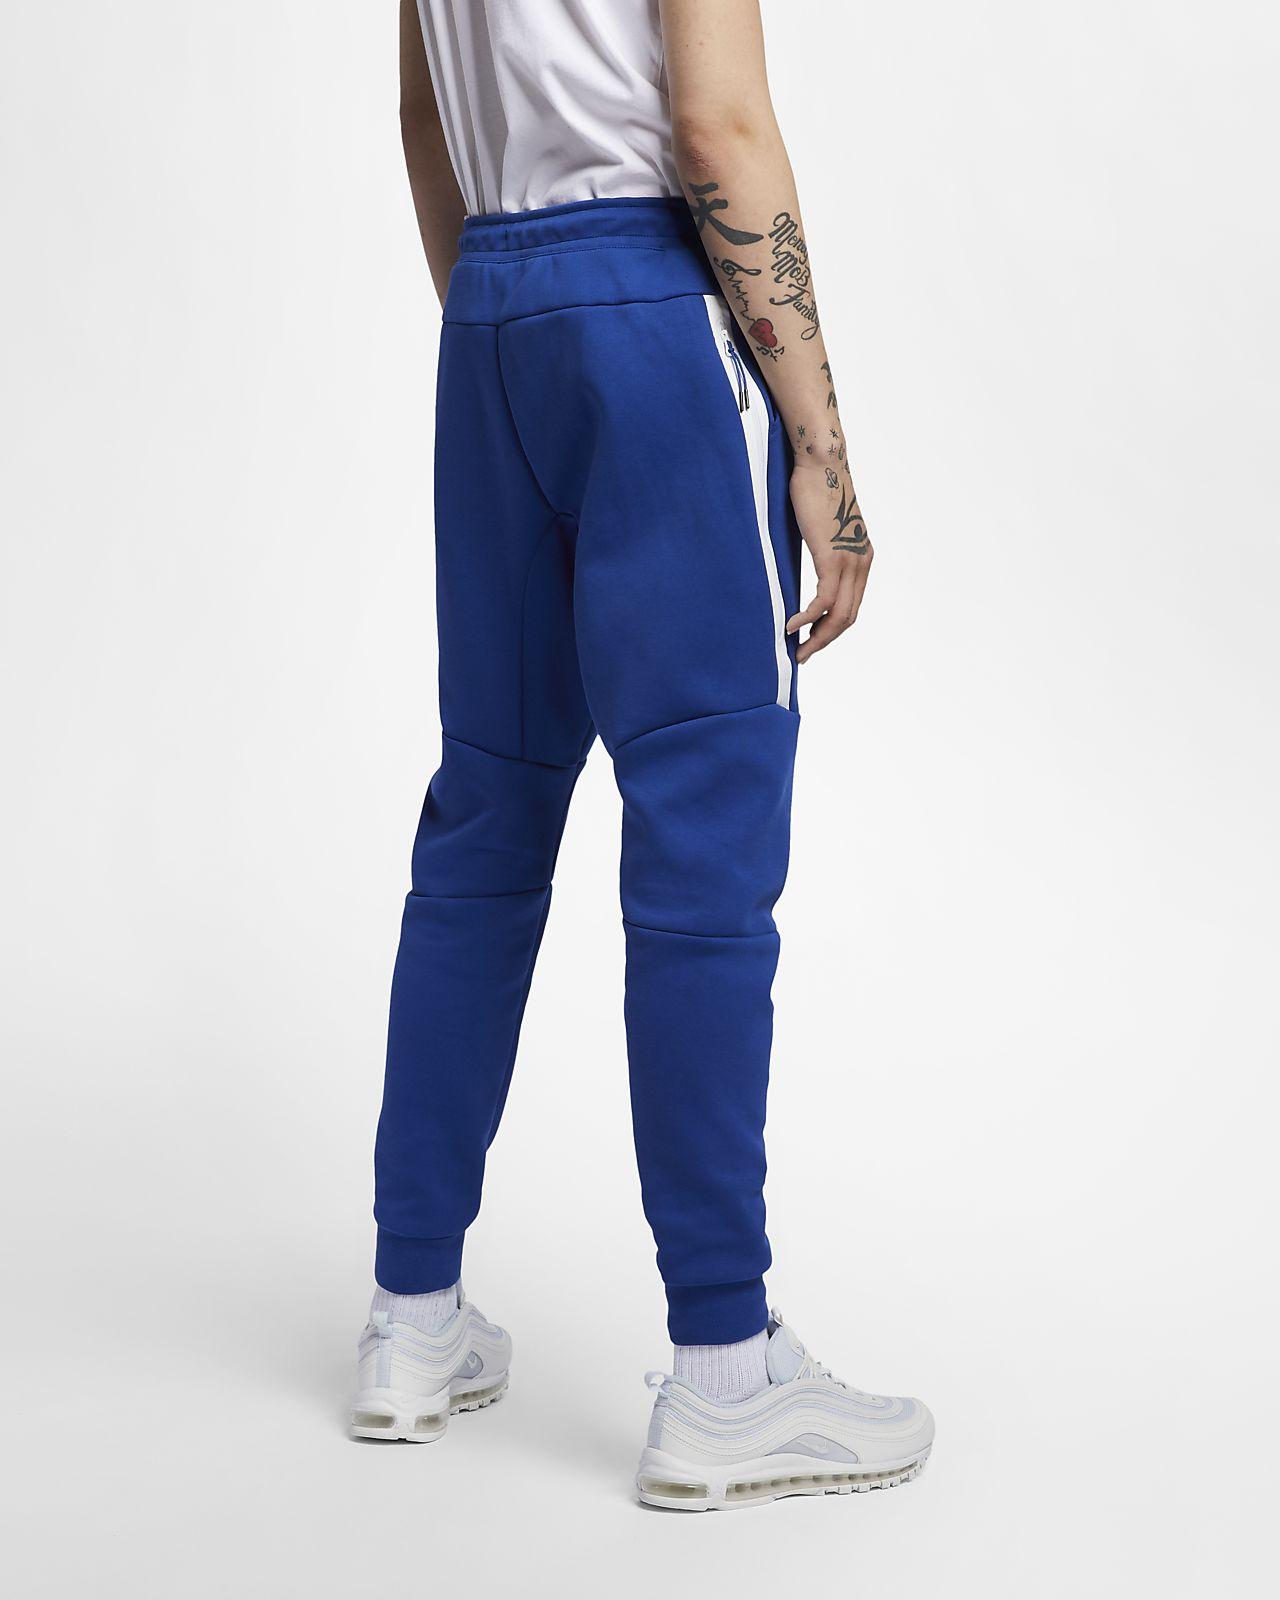 price reduced best prices info for Pantalon de jogging Nike Sportswear Tech Fleece pour Homme